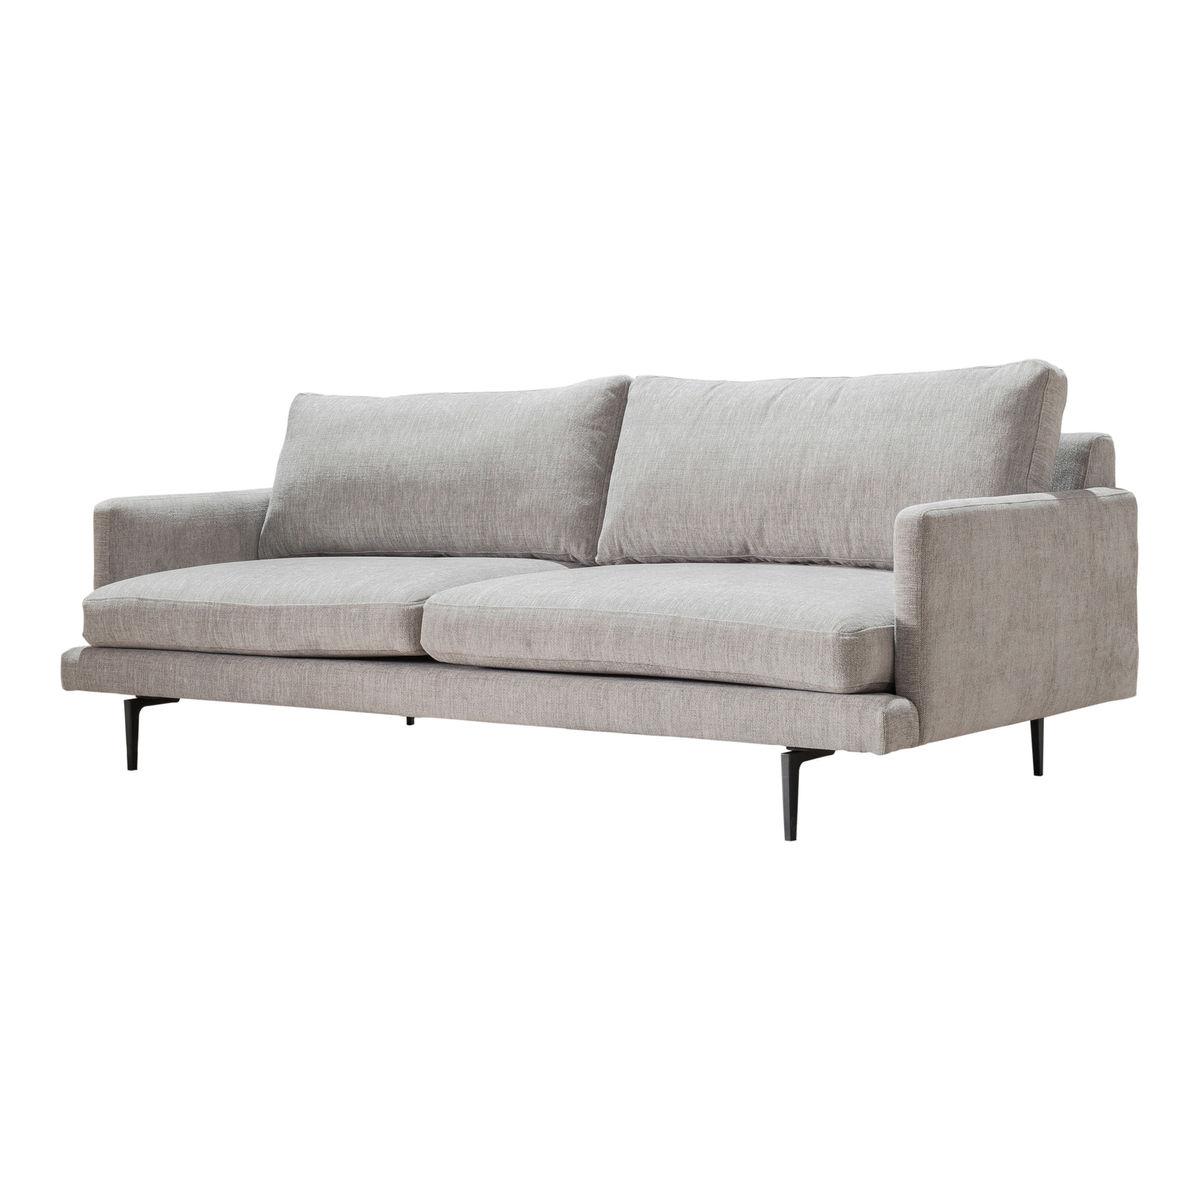 Zeeburg Sofa